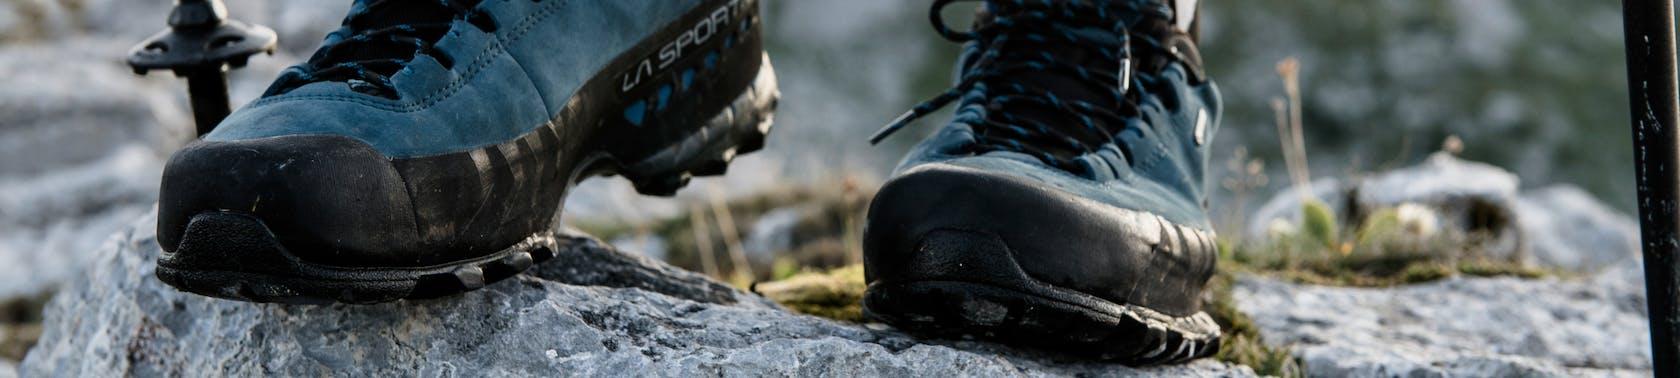 scarpe trekking